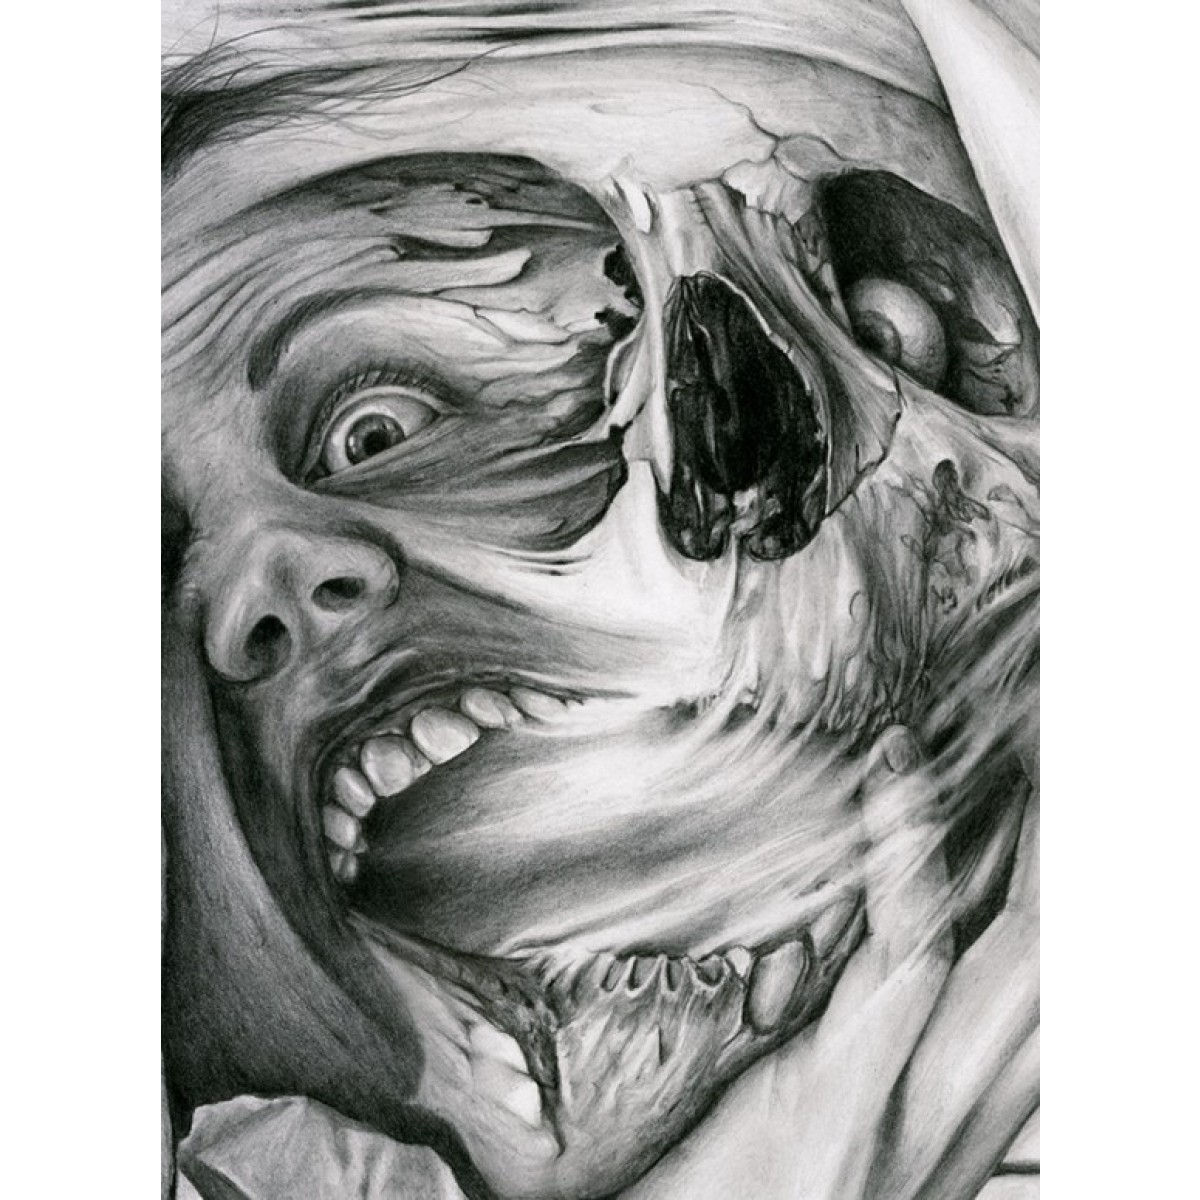 Black and gray tattoo art